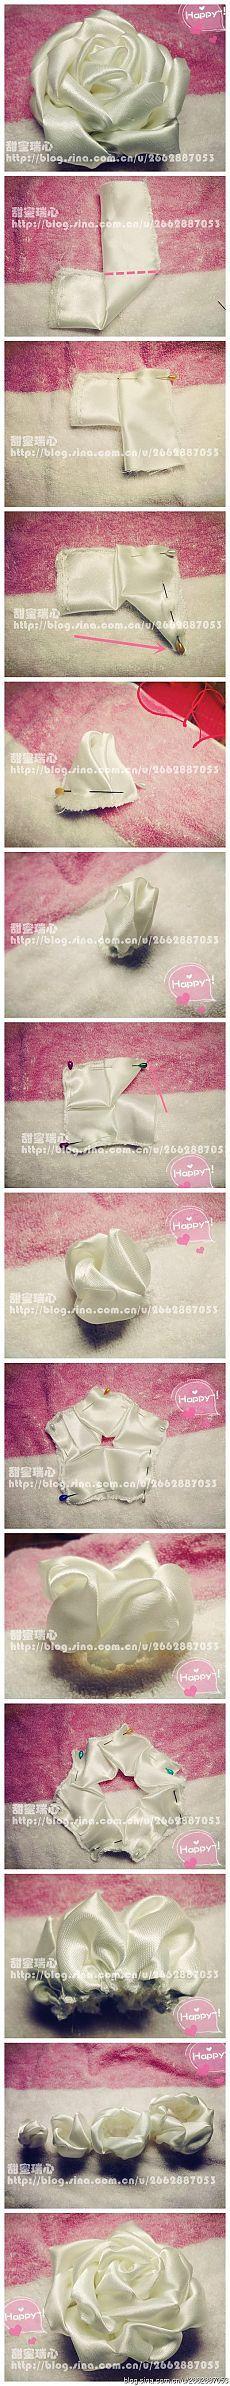 made with ribbon roses...♥ Deniz ♥: